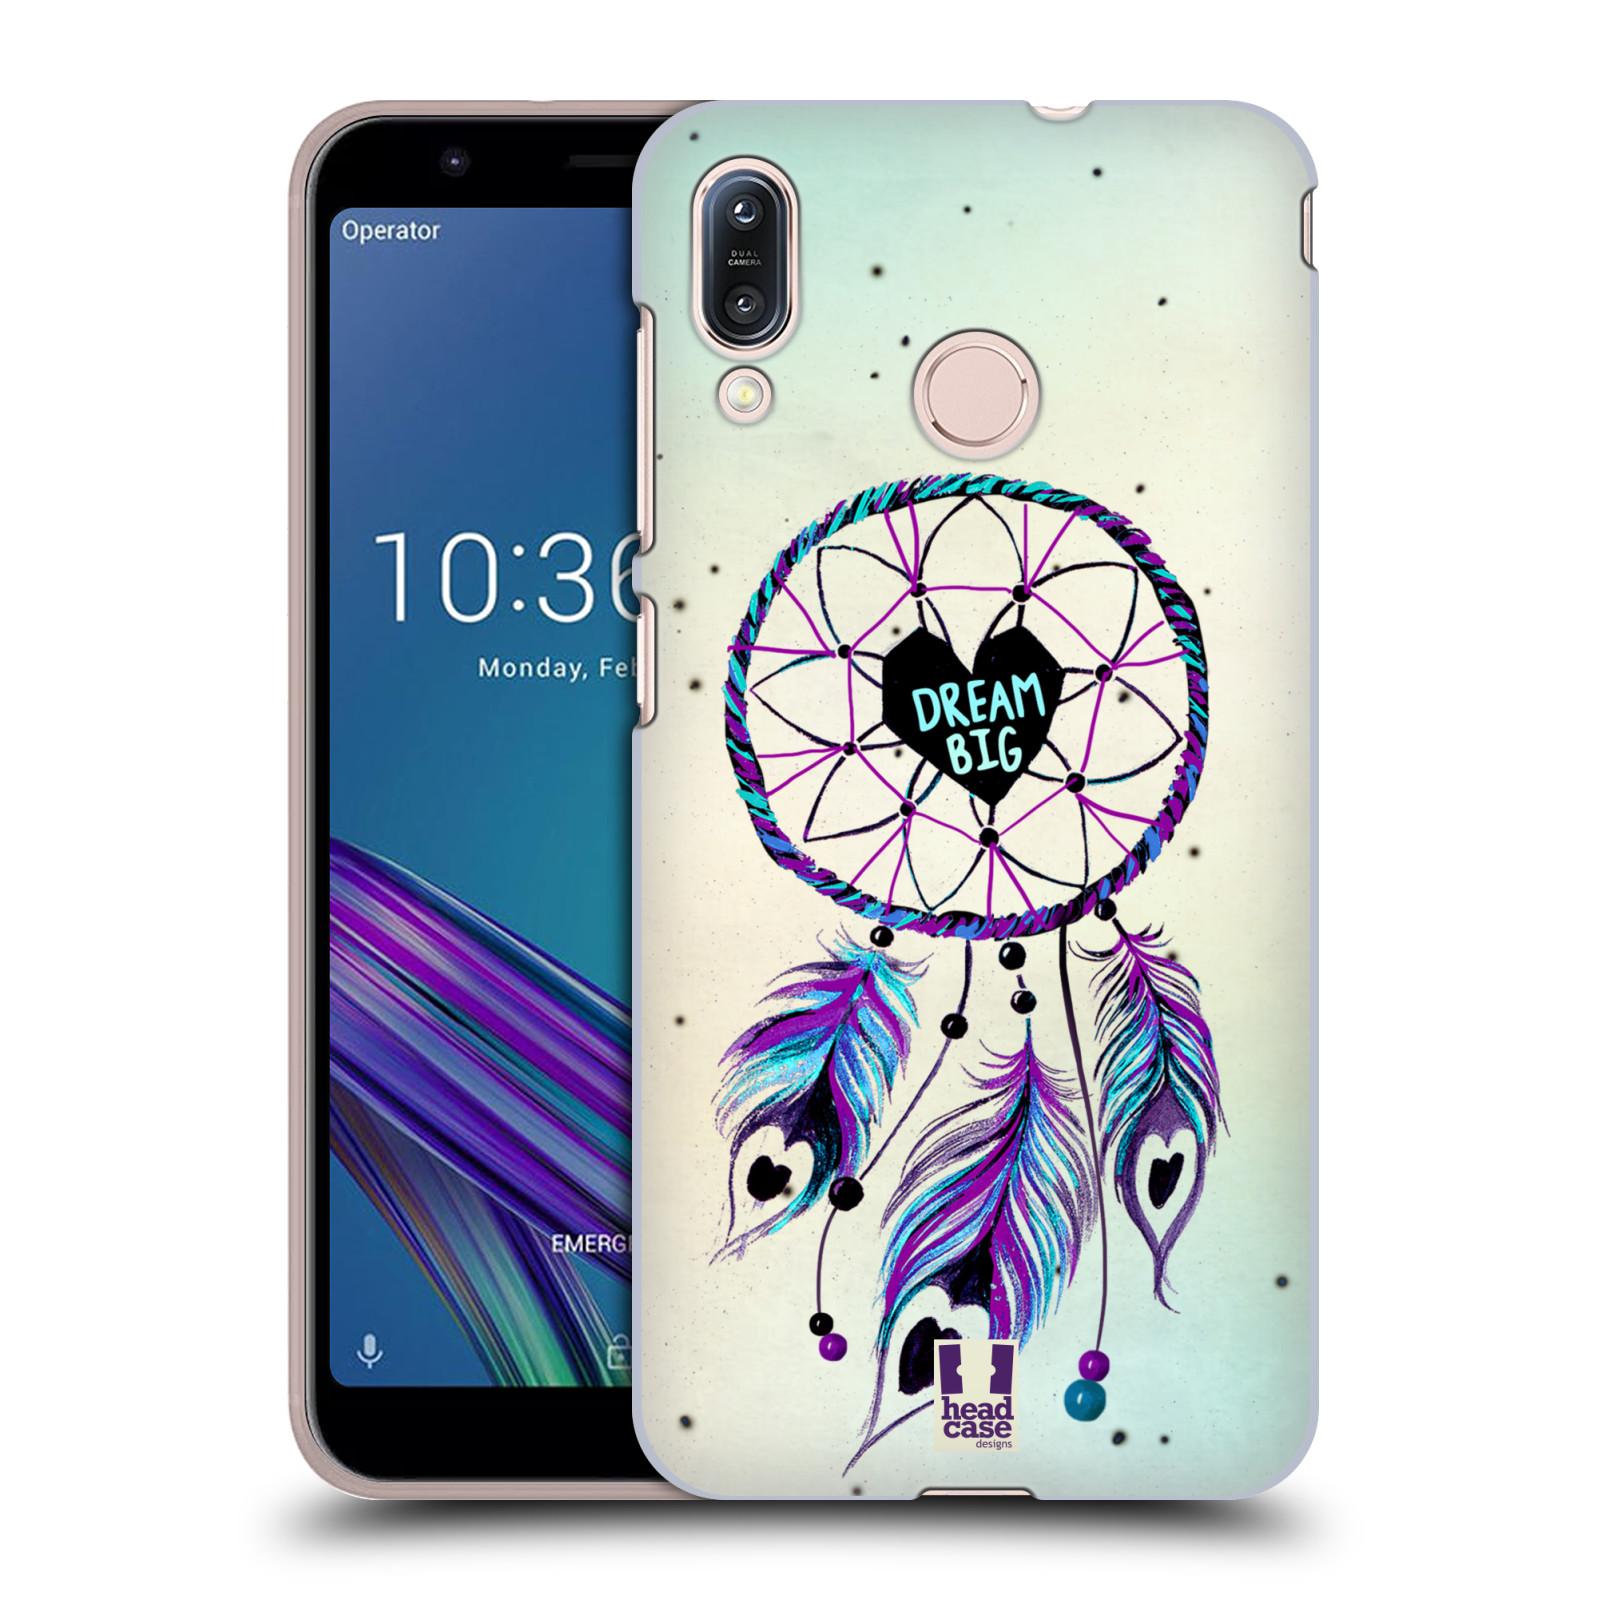 Plastové pouzdro na mobil Asus Zenfone Max M1 ZB555KL - Head Case - Lapač Assorted Dream Big Srdce